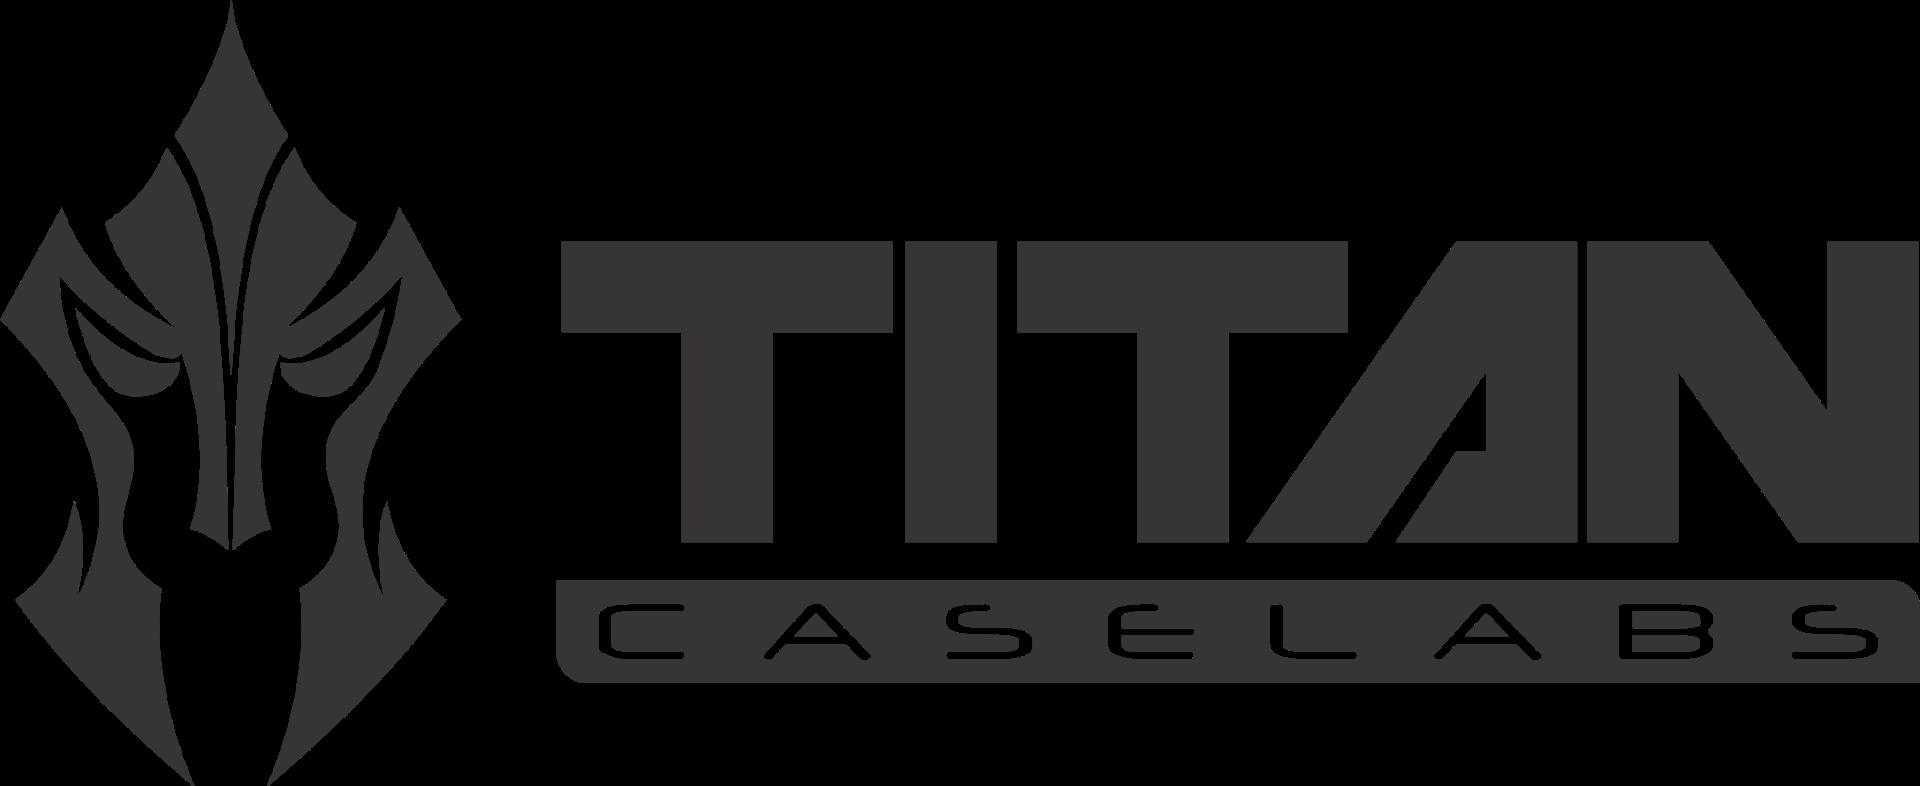 TitanCaselabs